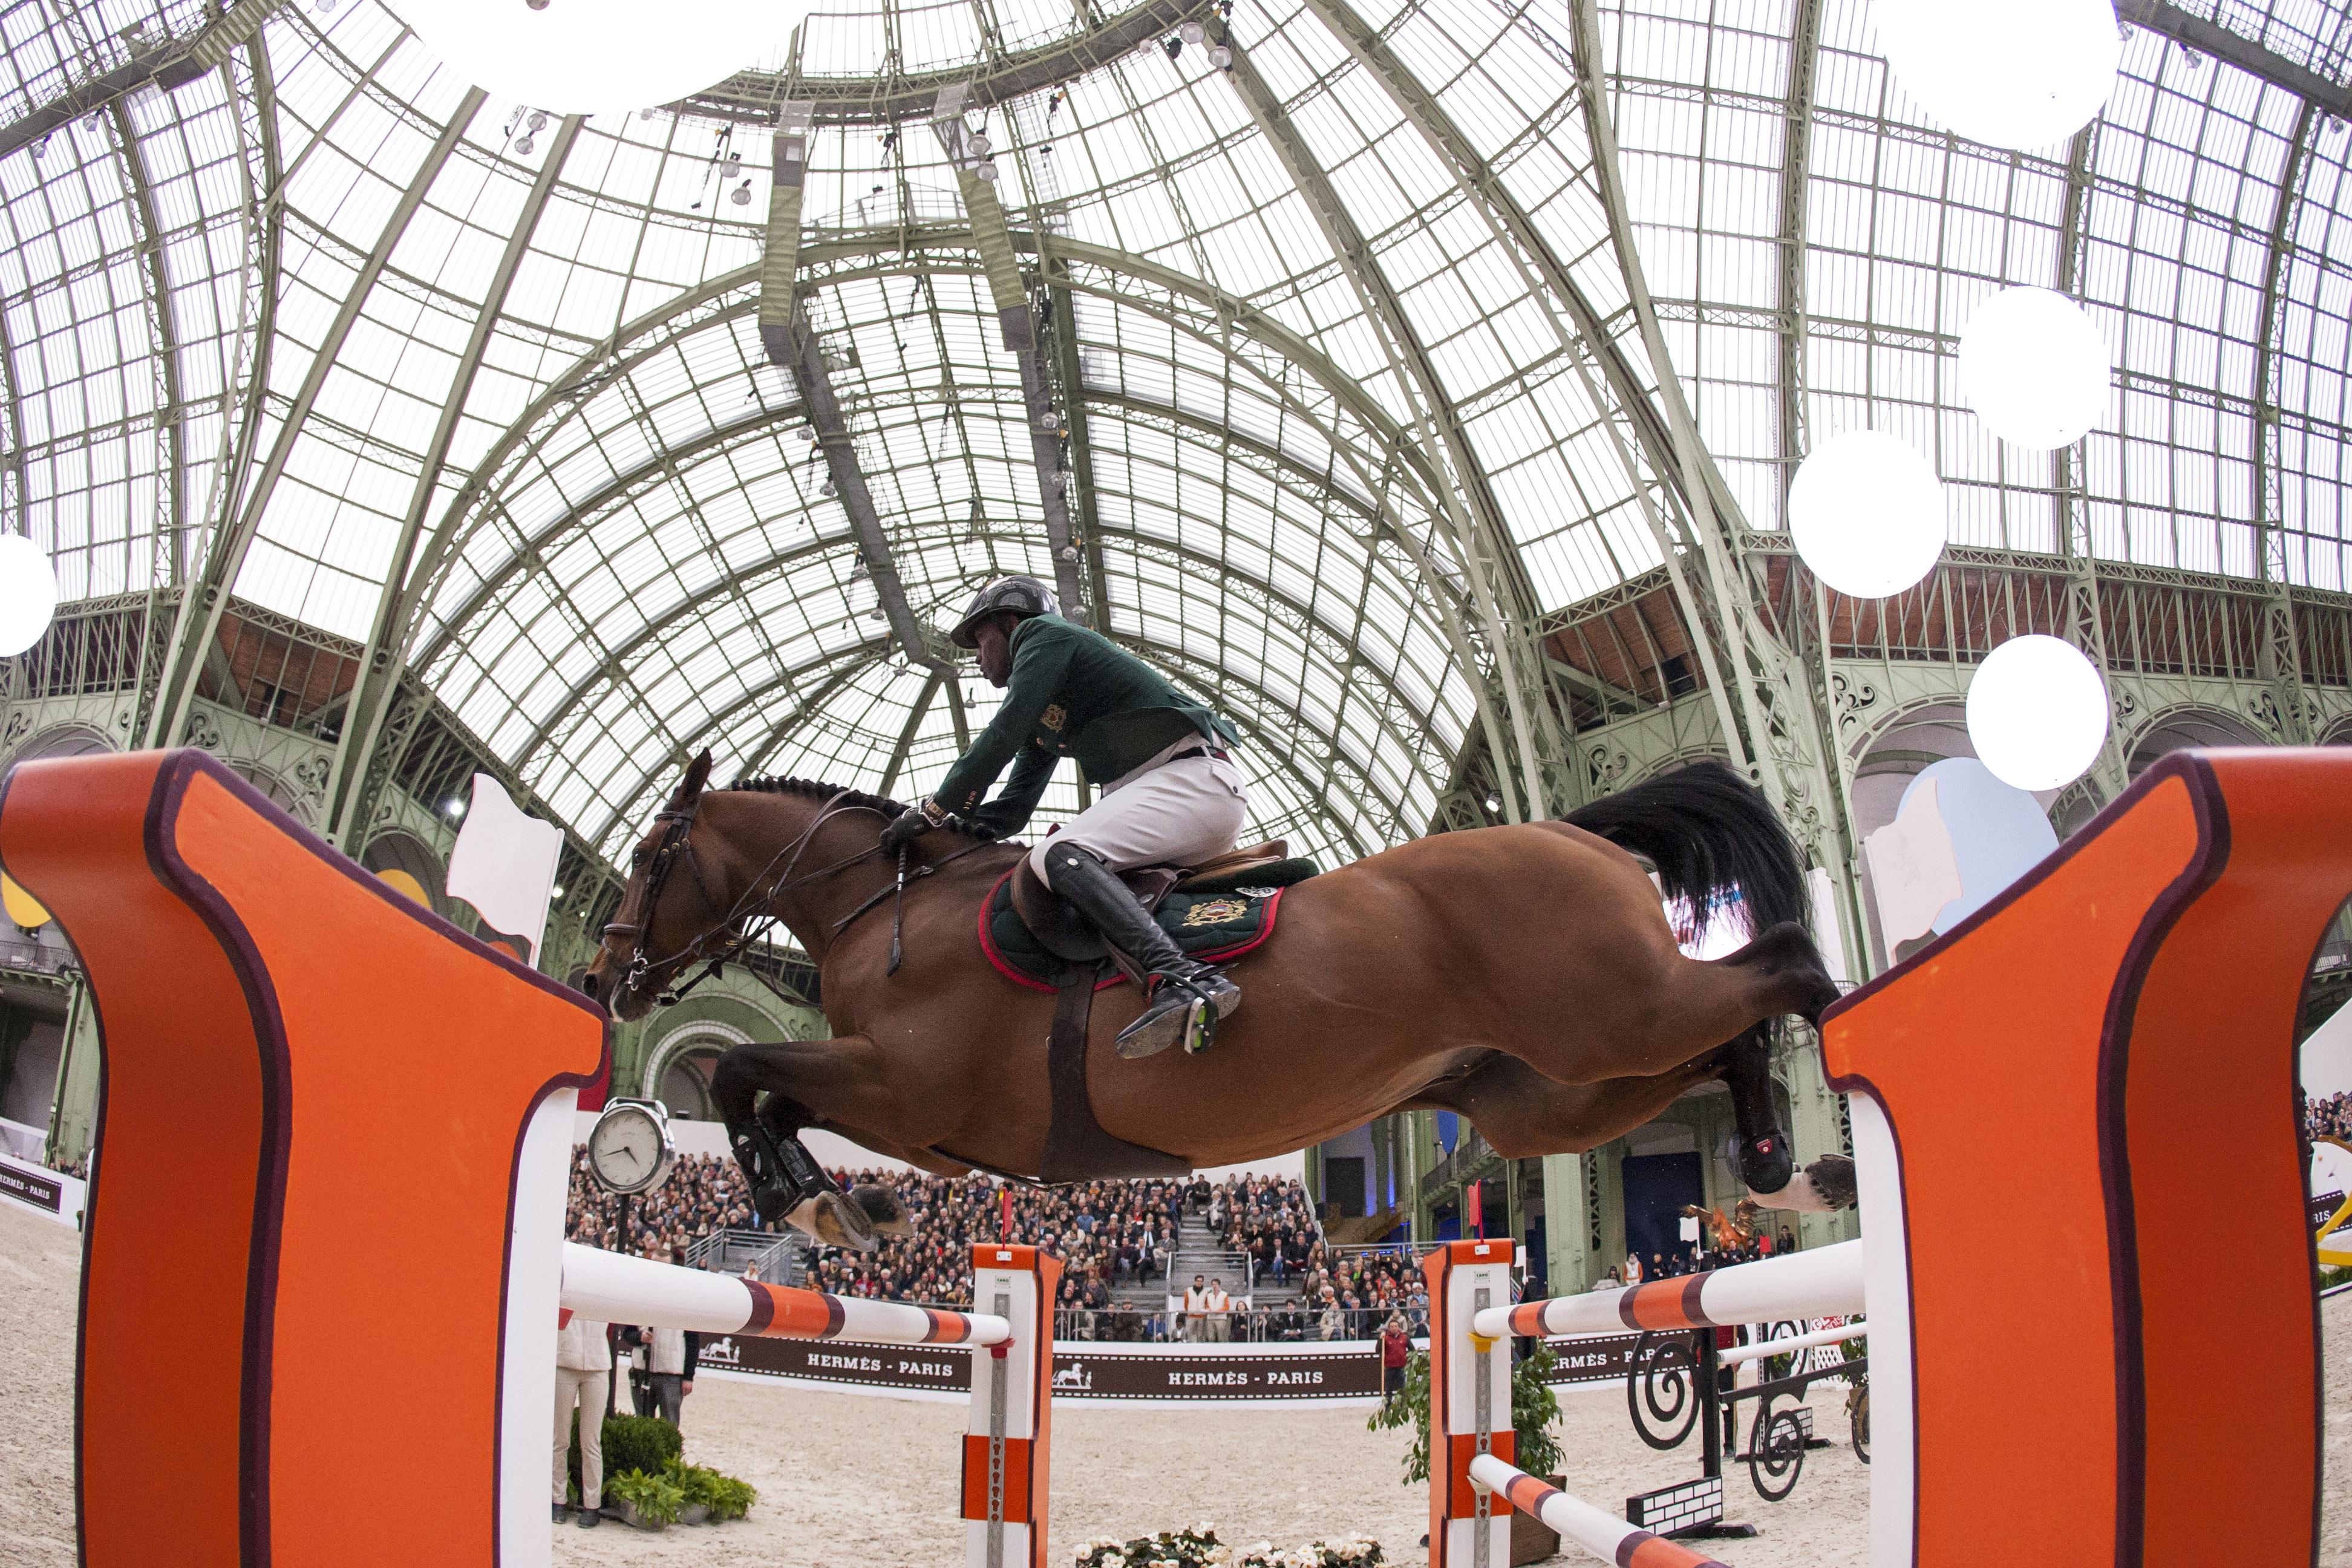 Winning horse rider at Saut Hermes